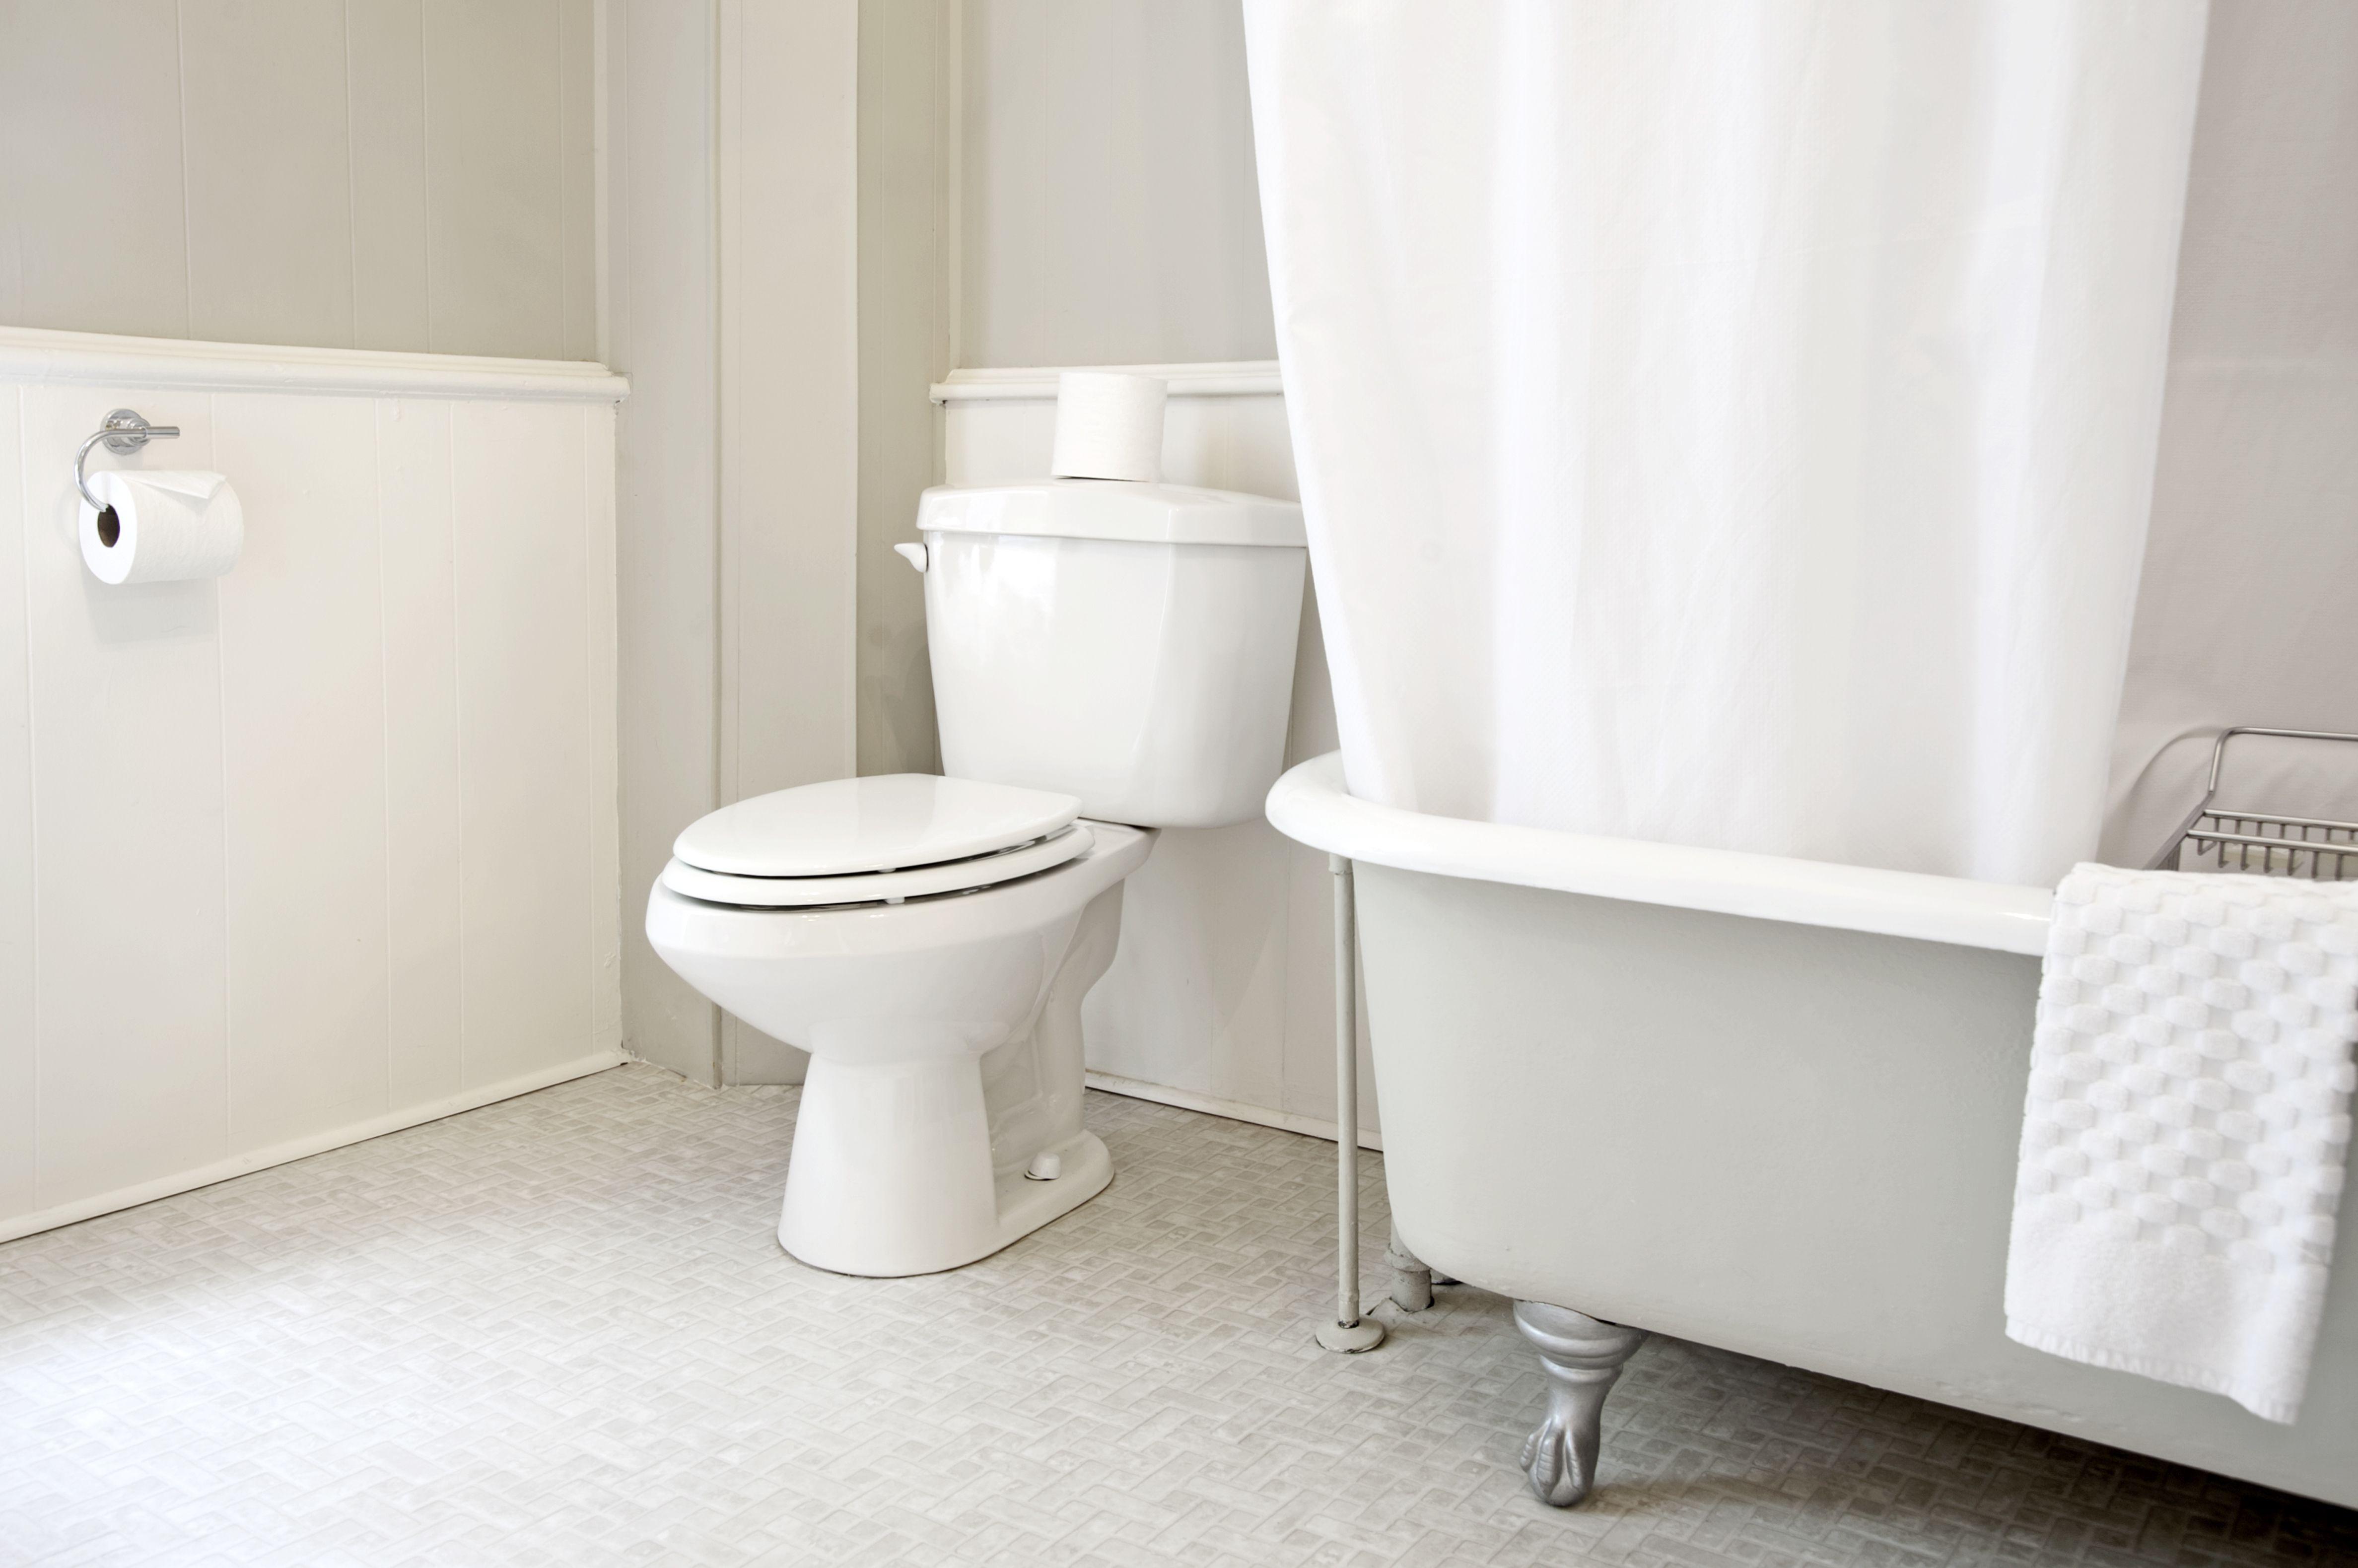 bath barton americanstandardestatevormaxtoilet estate styles and vormax floor toilet american standard